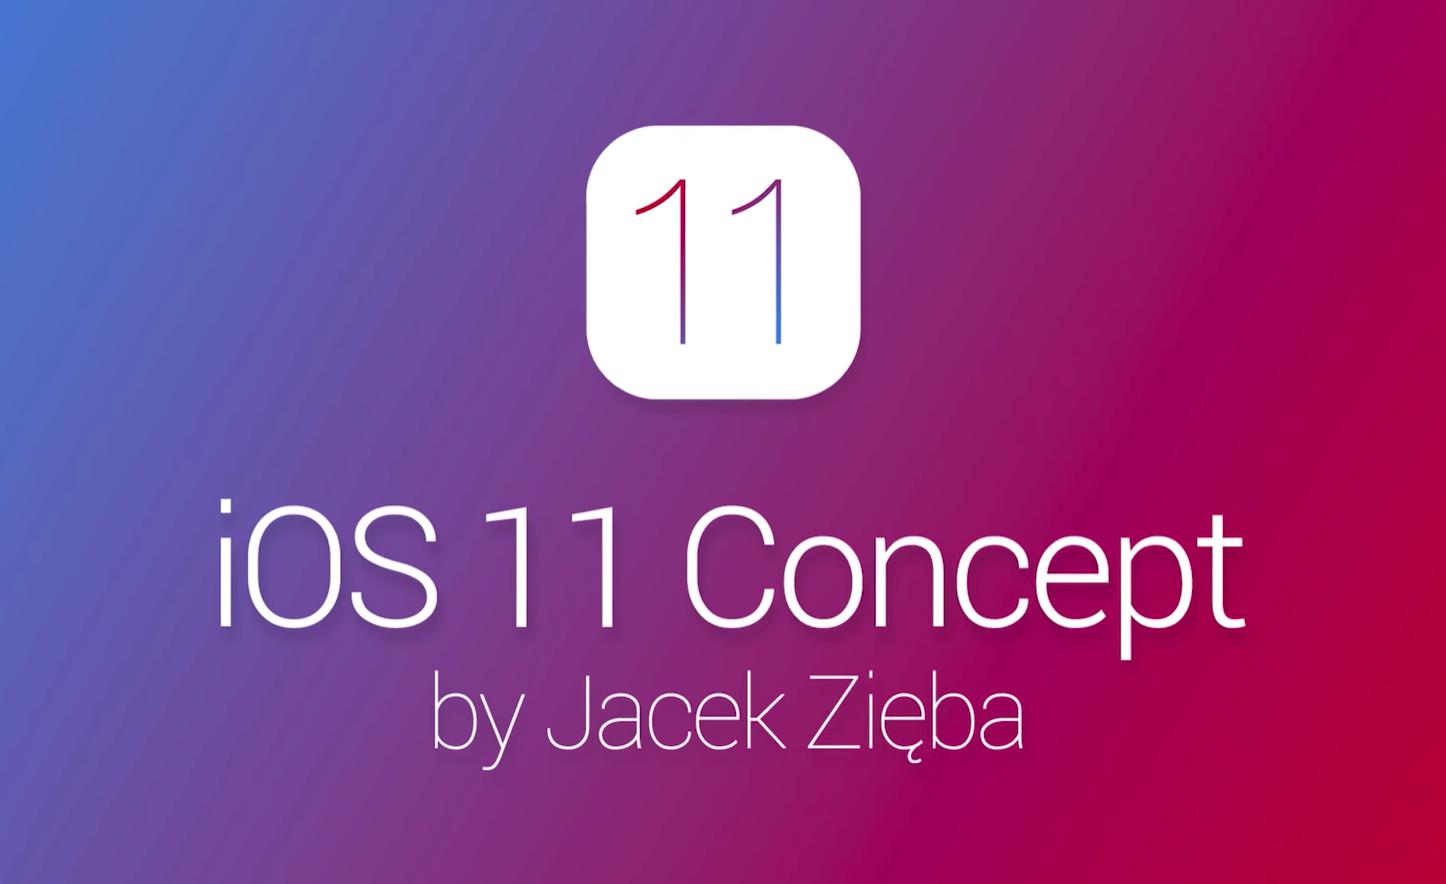 Ios 11 concept image